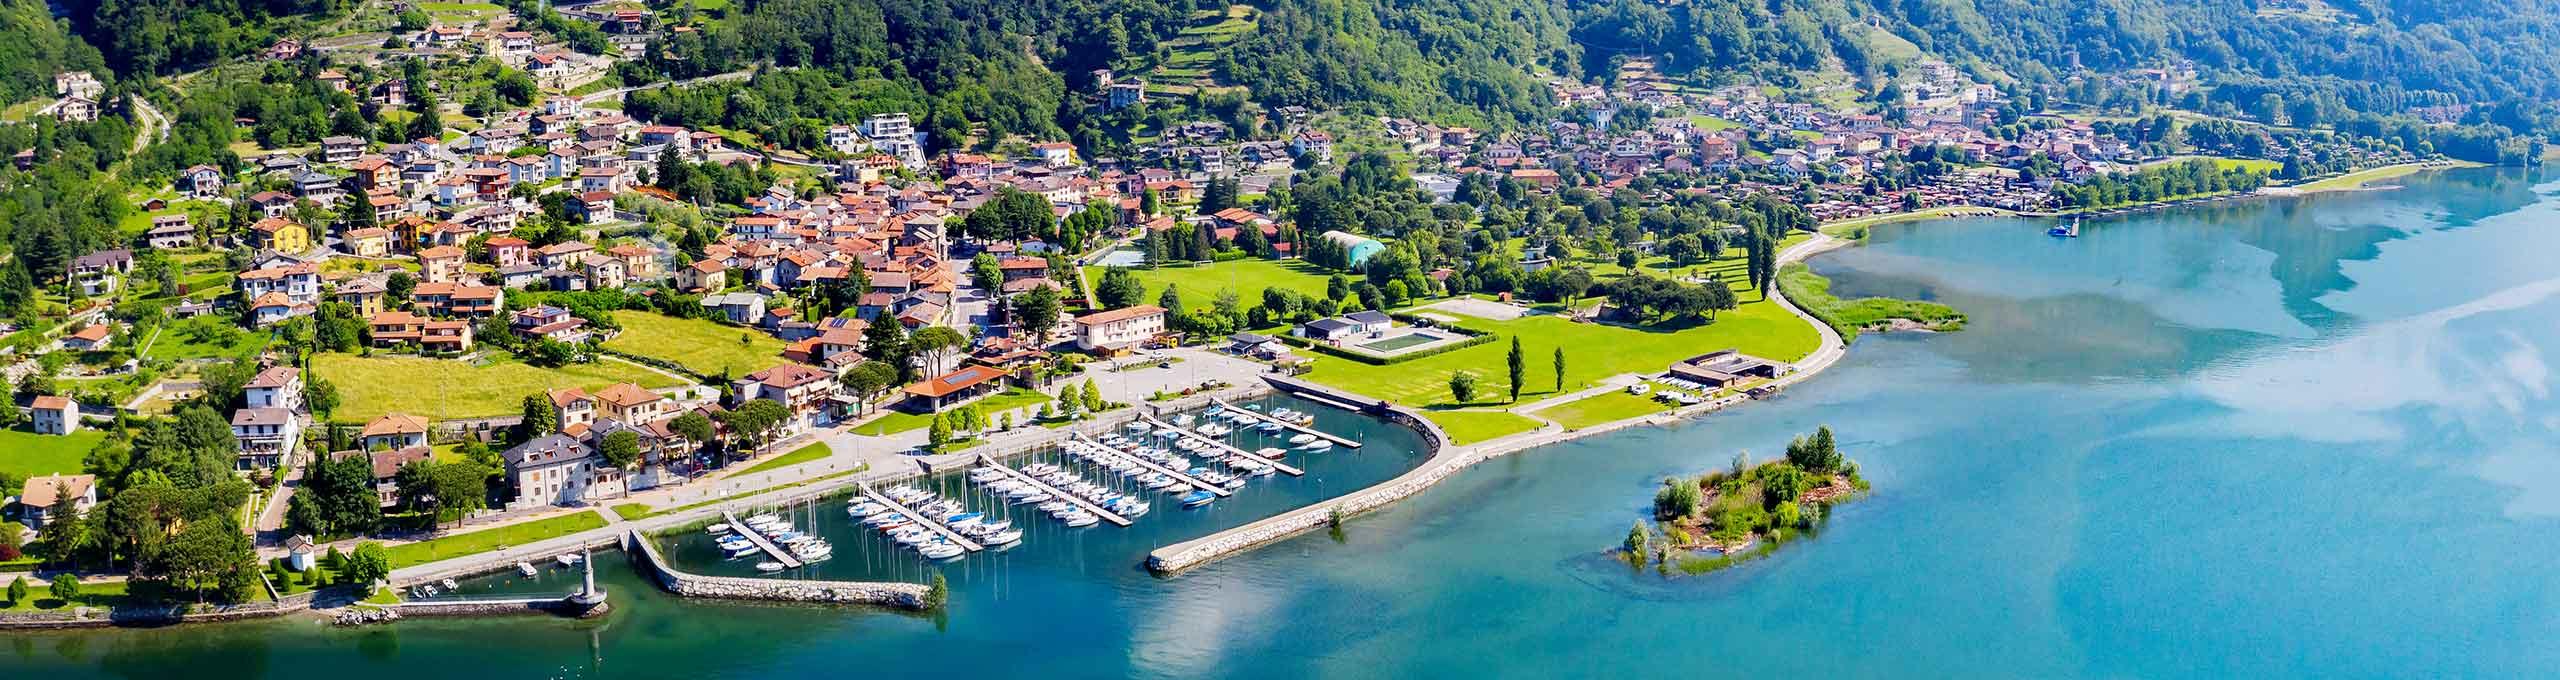 Gera Lario, Lago di Como